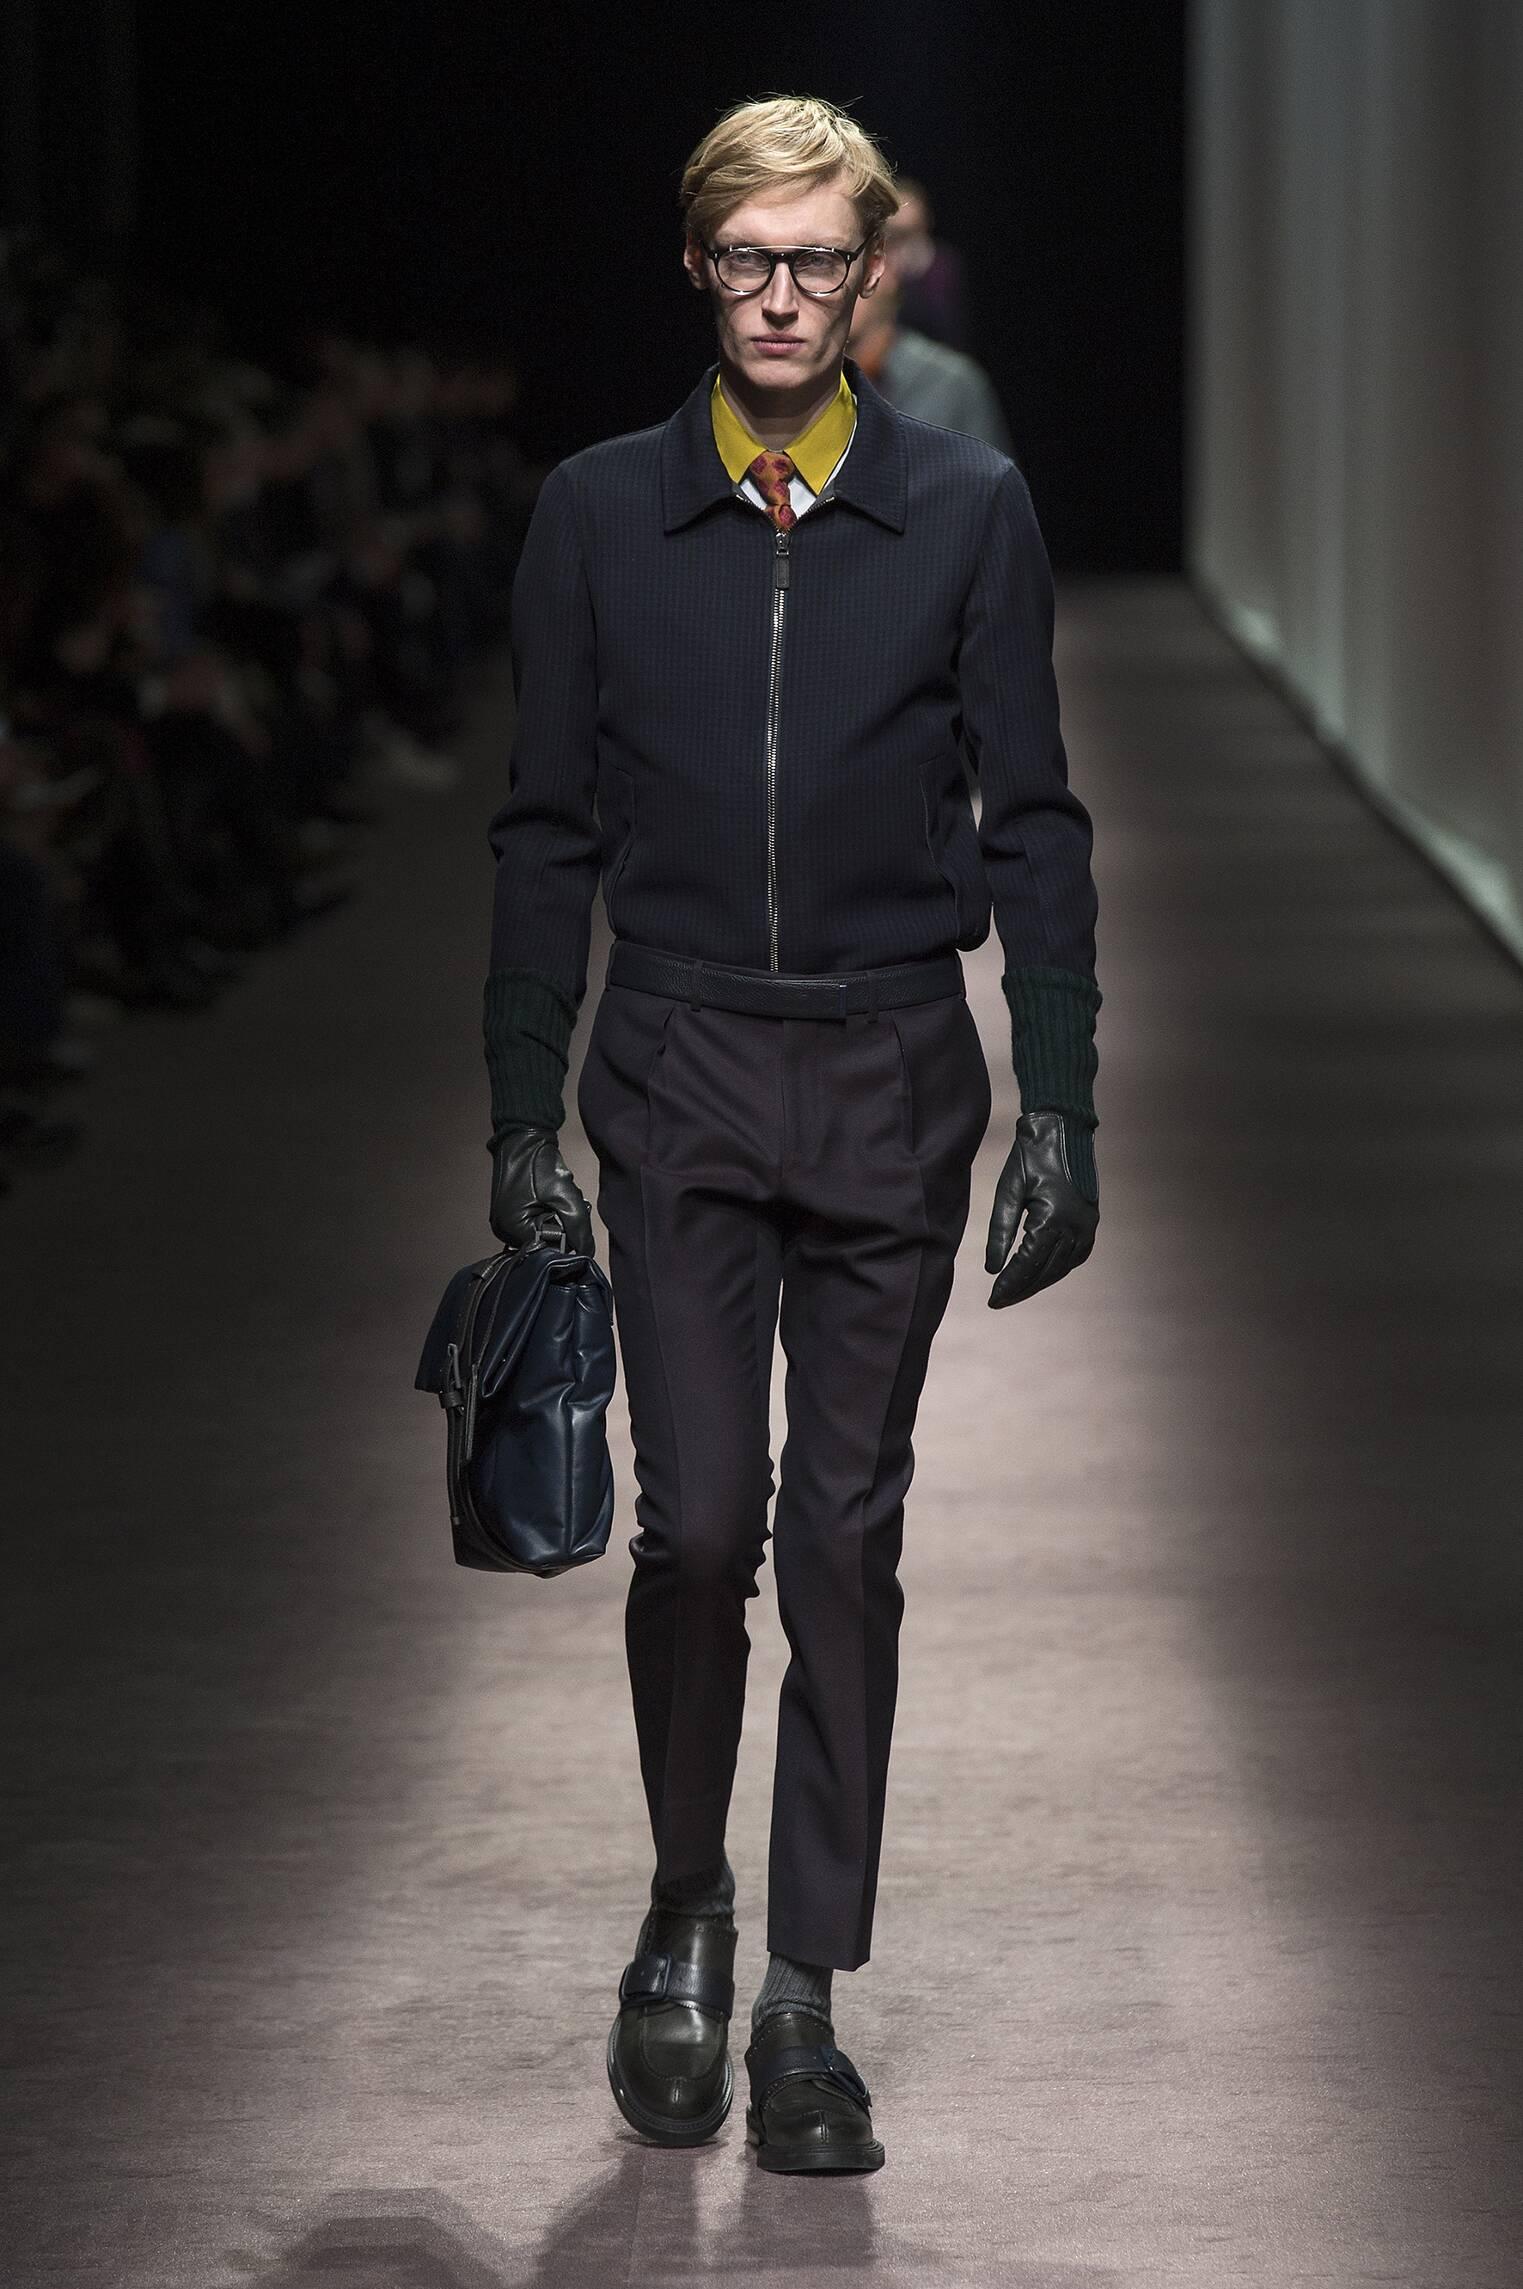 Winter Fashion Trends 2016-17 Canali